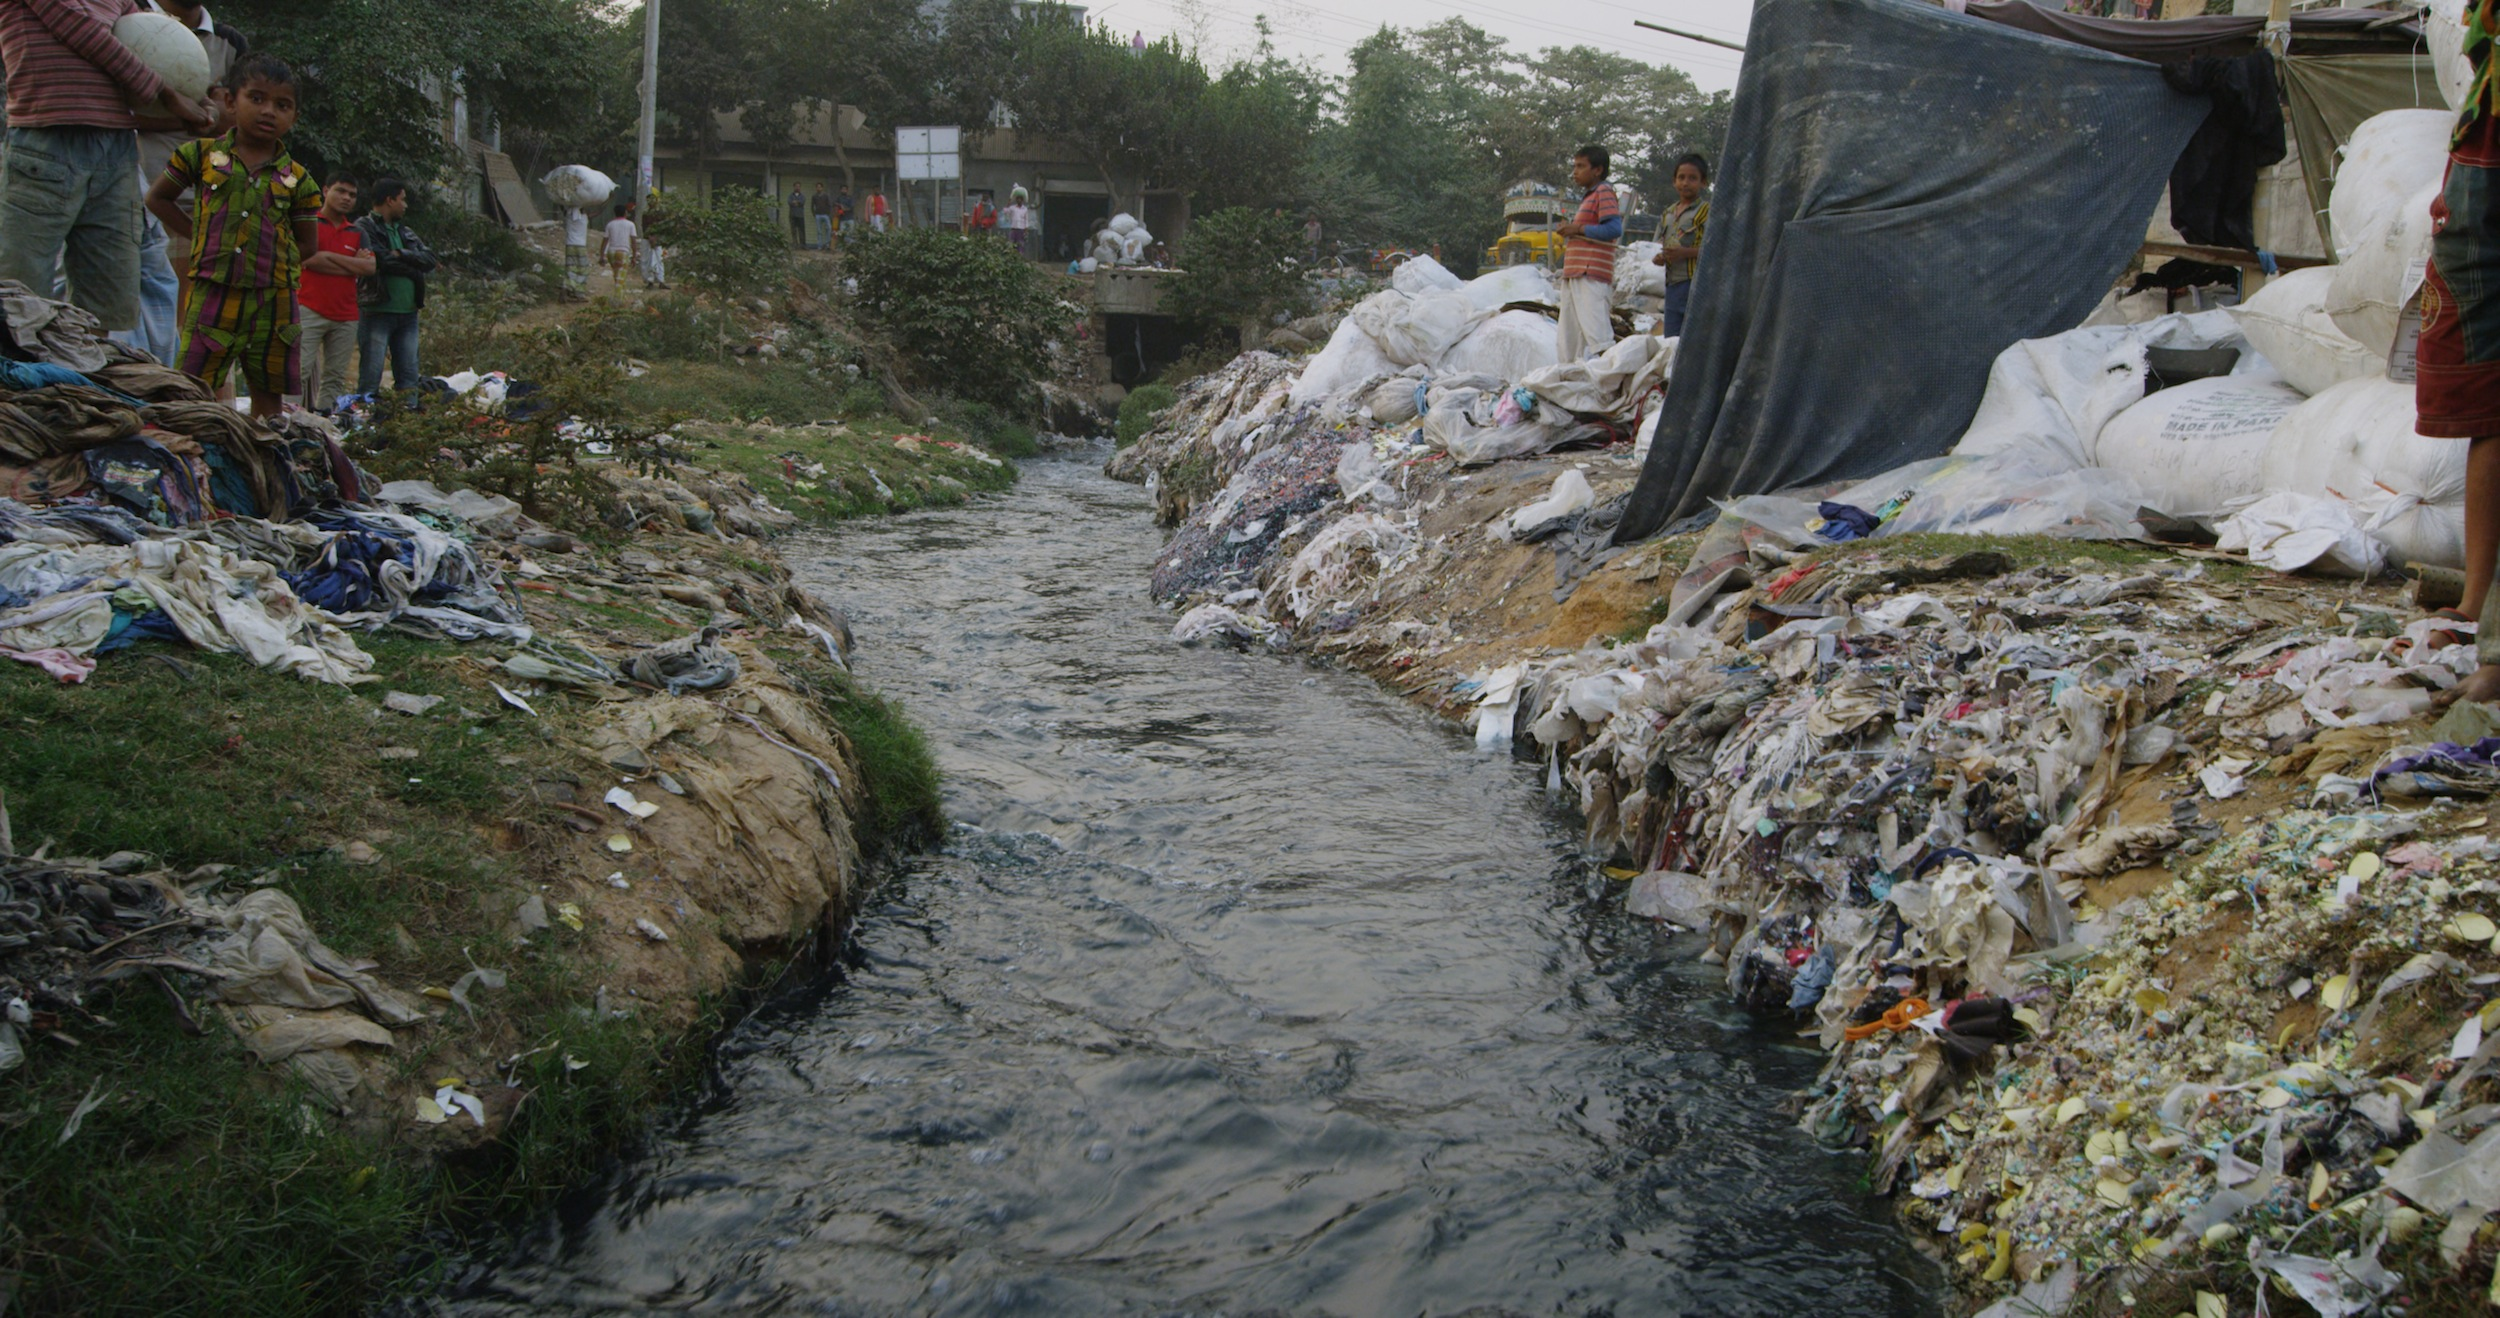 fast fashion - riverblue - fashion pollution - fashion environmental impact - toxic fashion - cheap fashion environment - textile waste - fashion pollution - fast fashion pollution